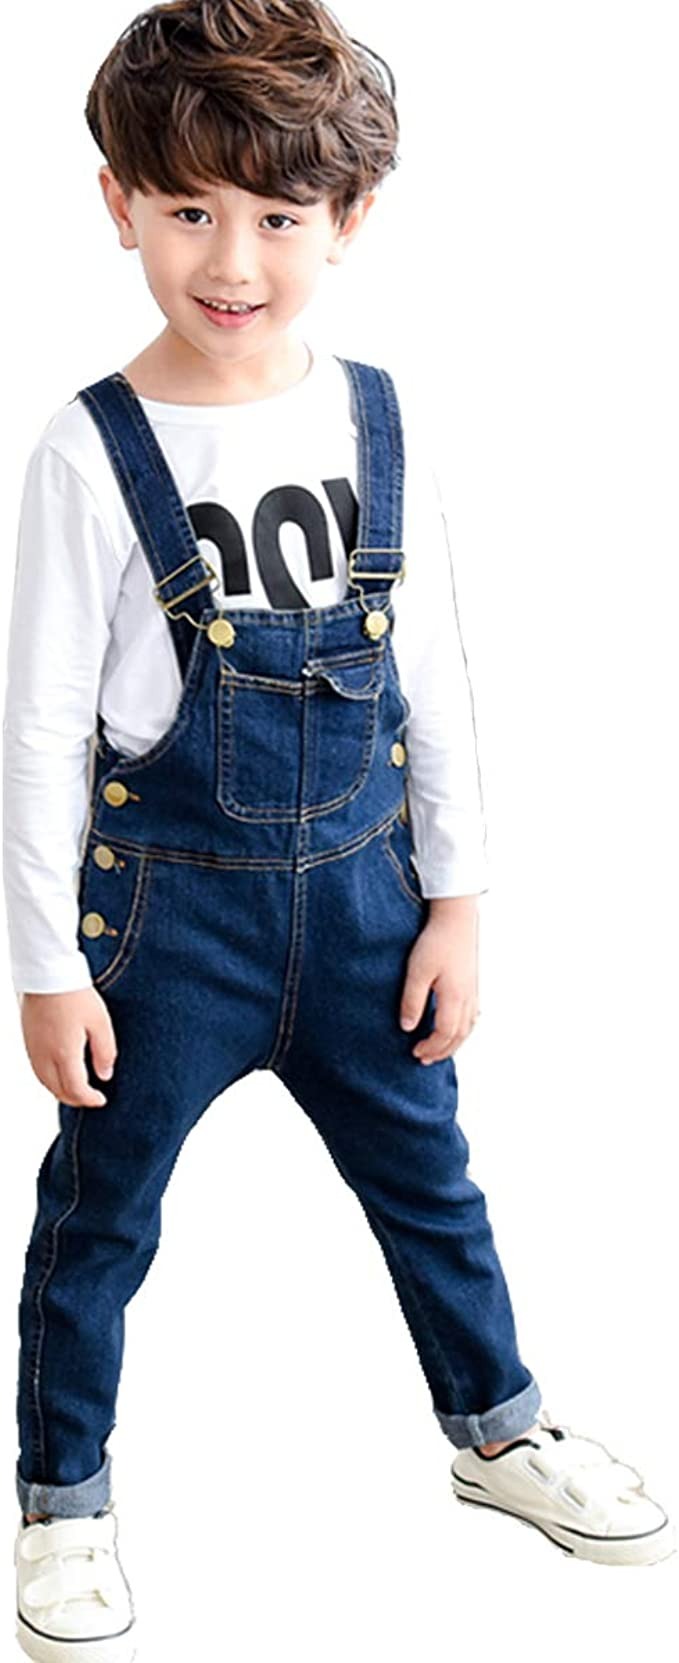 Amazon.com: OnlyAngel Boys' Suspender Jeans Adjustable Straps Cotton Denim  Overalls Age 4-13: Clothing